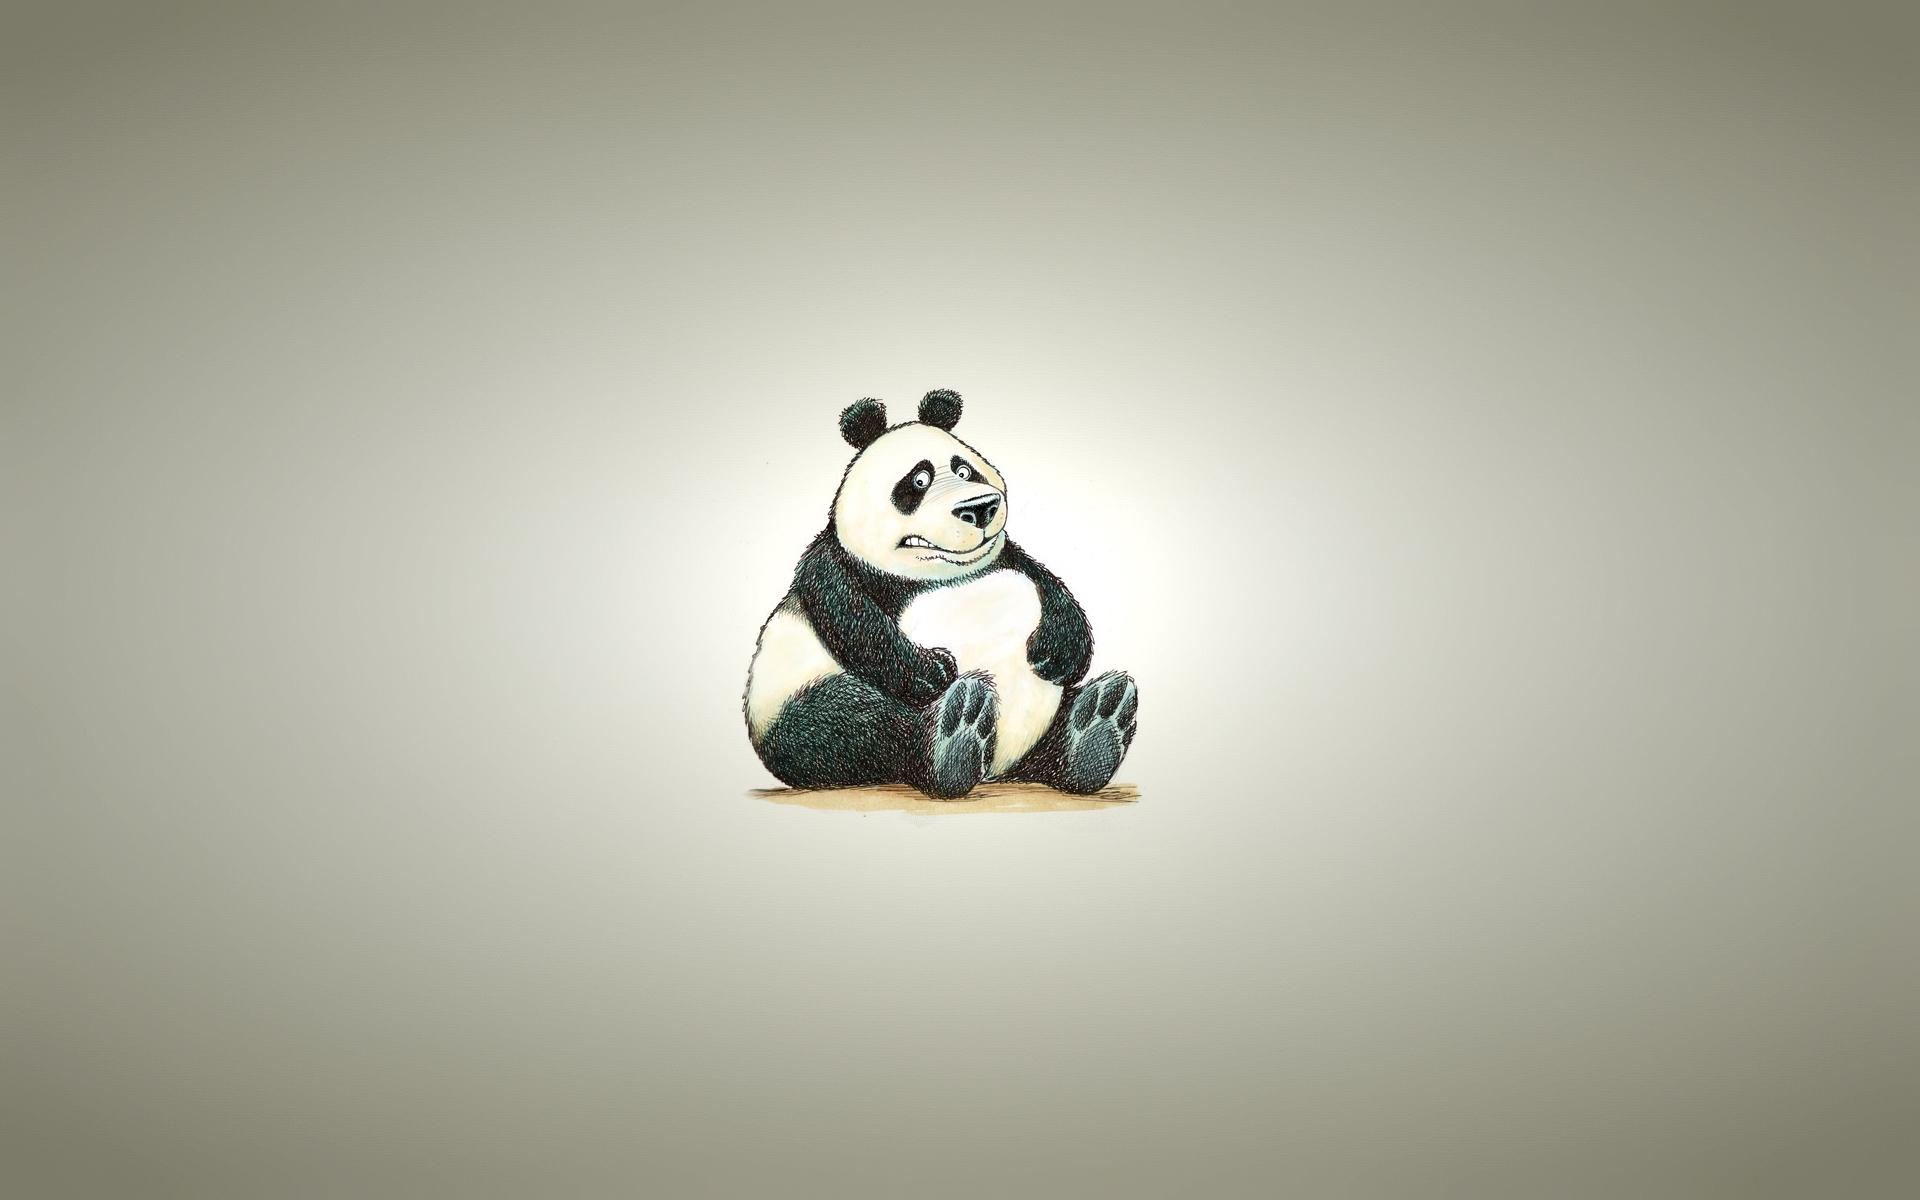 Cute Spongebob Wallpaper Cute Panda Wallpaper Hd Pixelstalk Net